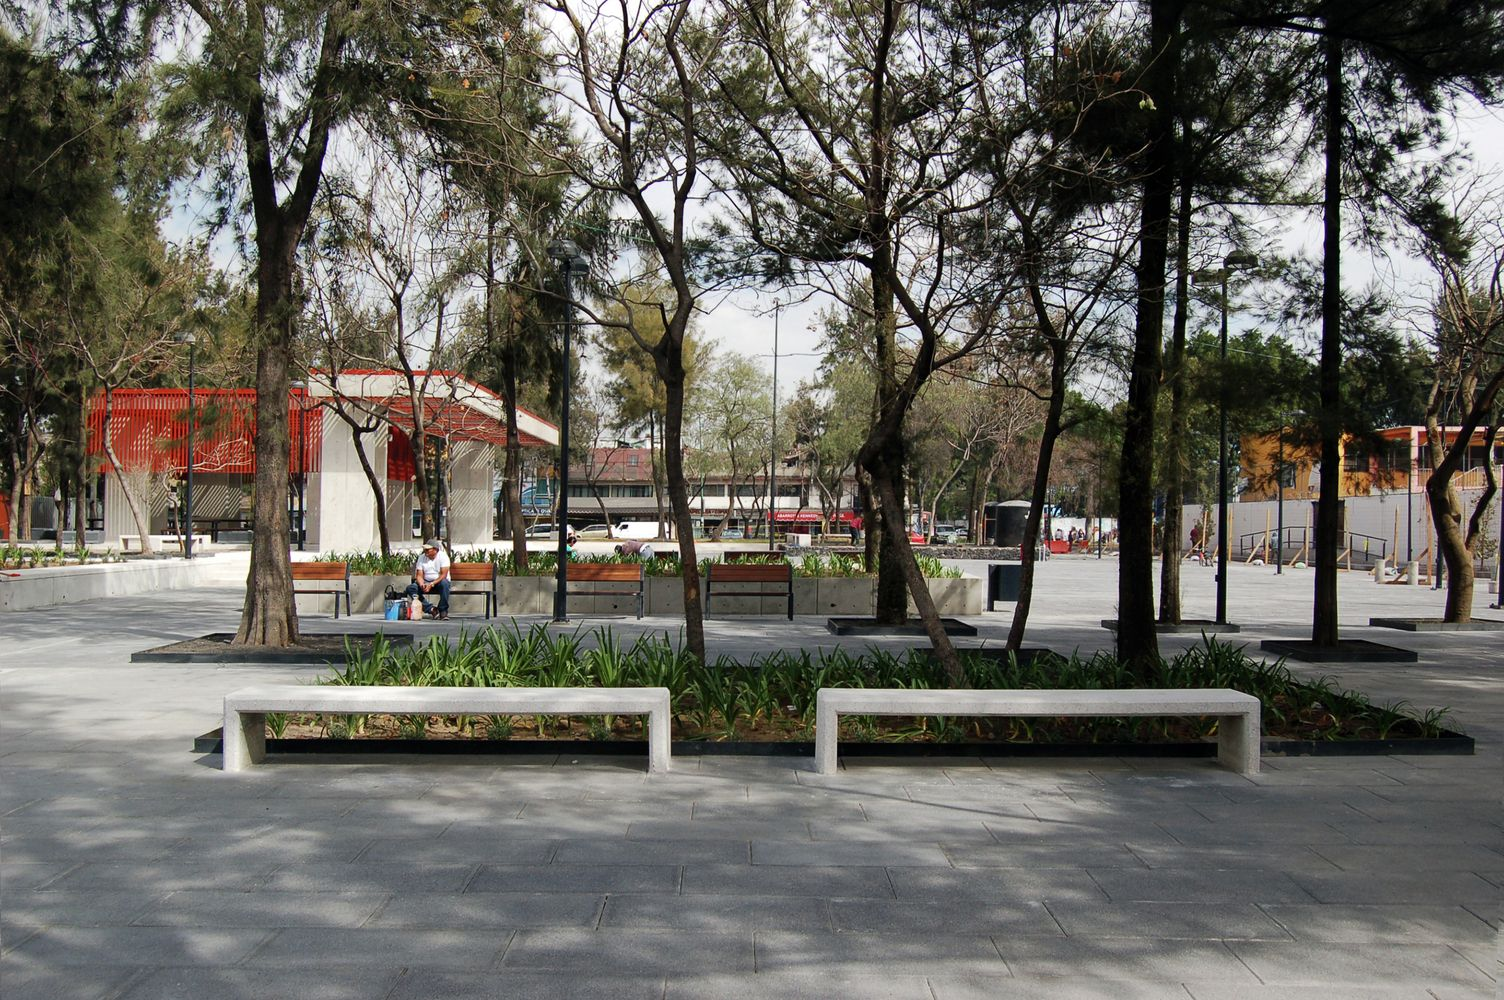 3 proyectos de intervención urbana que buscan recuperar el sentido de pertenencia en Iztapalapa, México,© Alejandro Gutiérrez